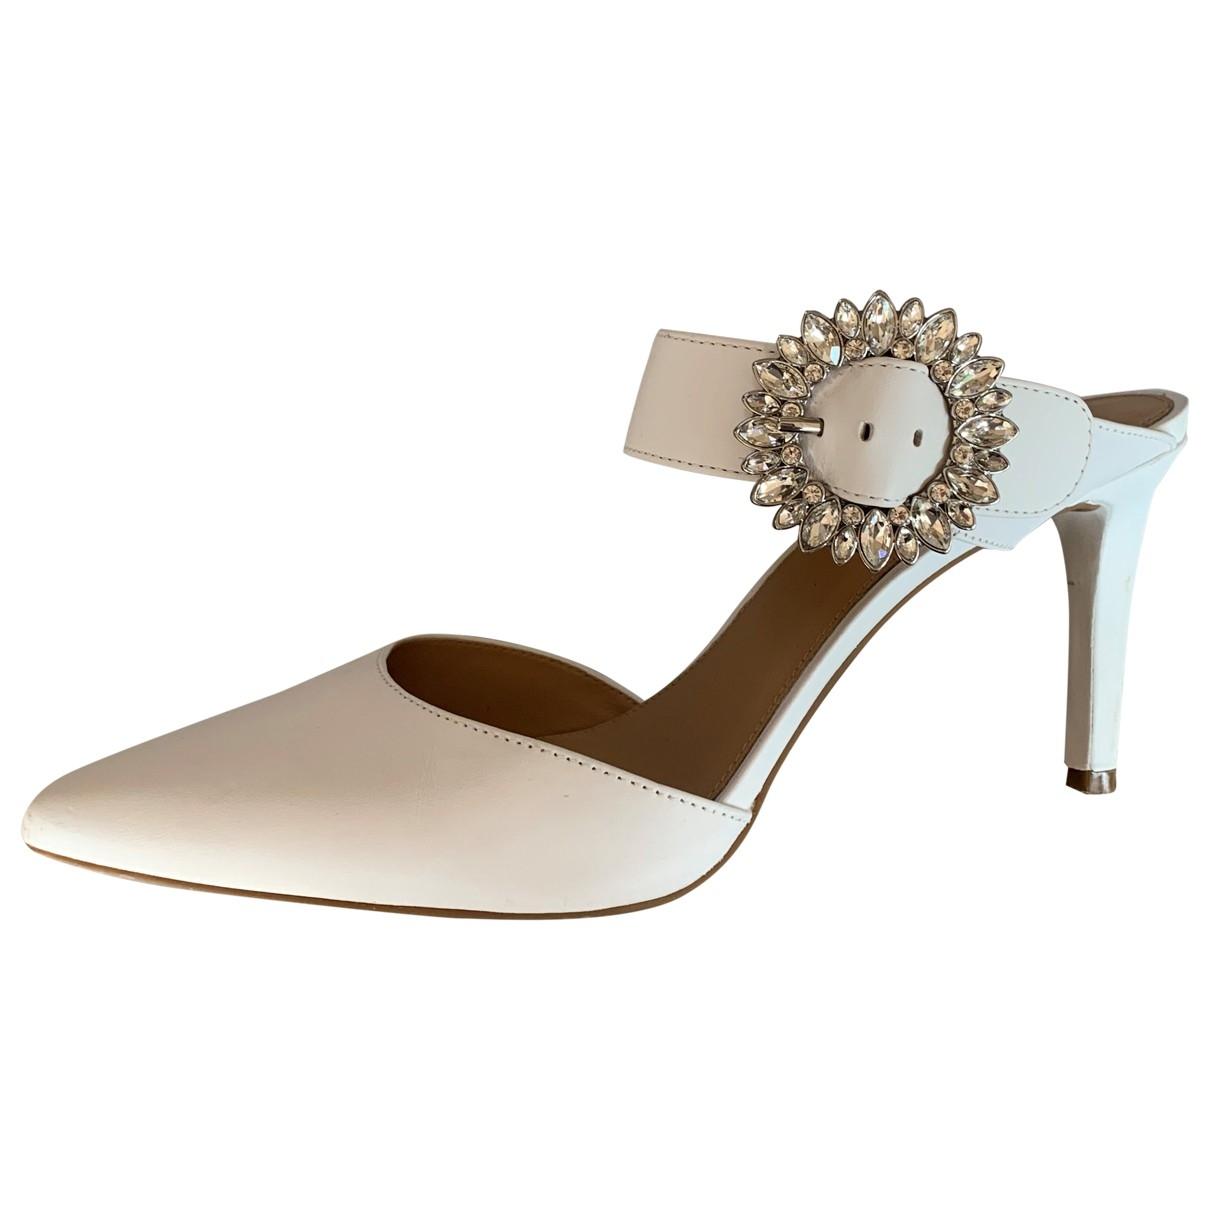 Michael Kors \N White Leather Heels for Women 8 US